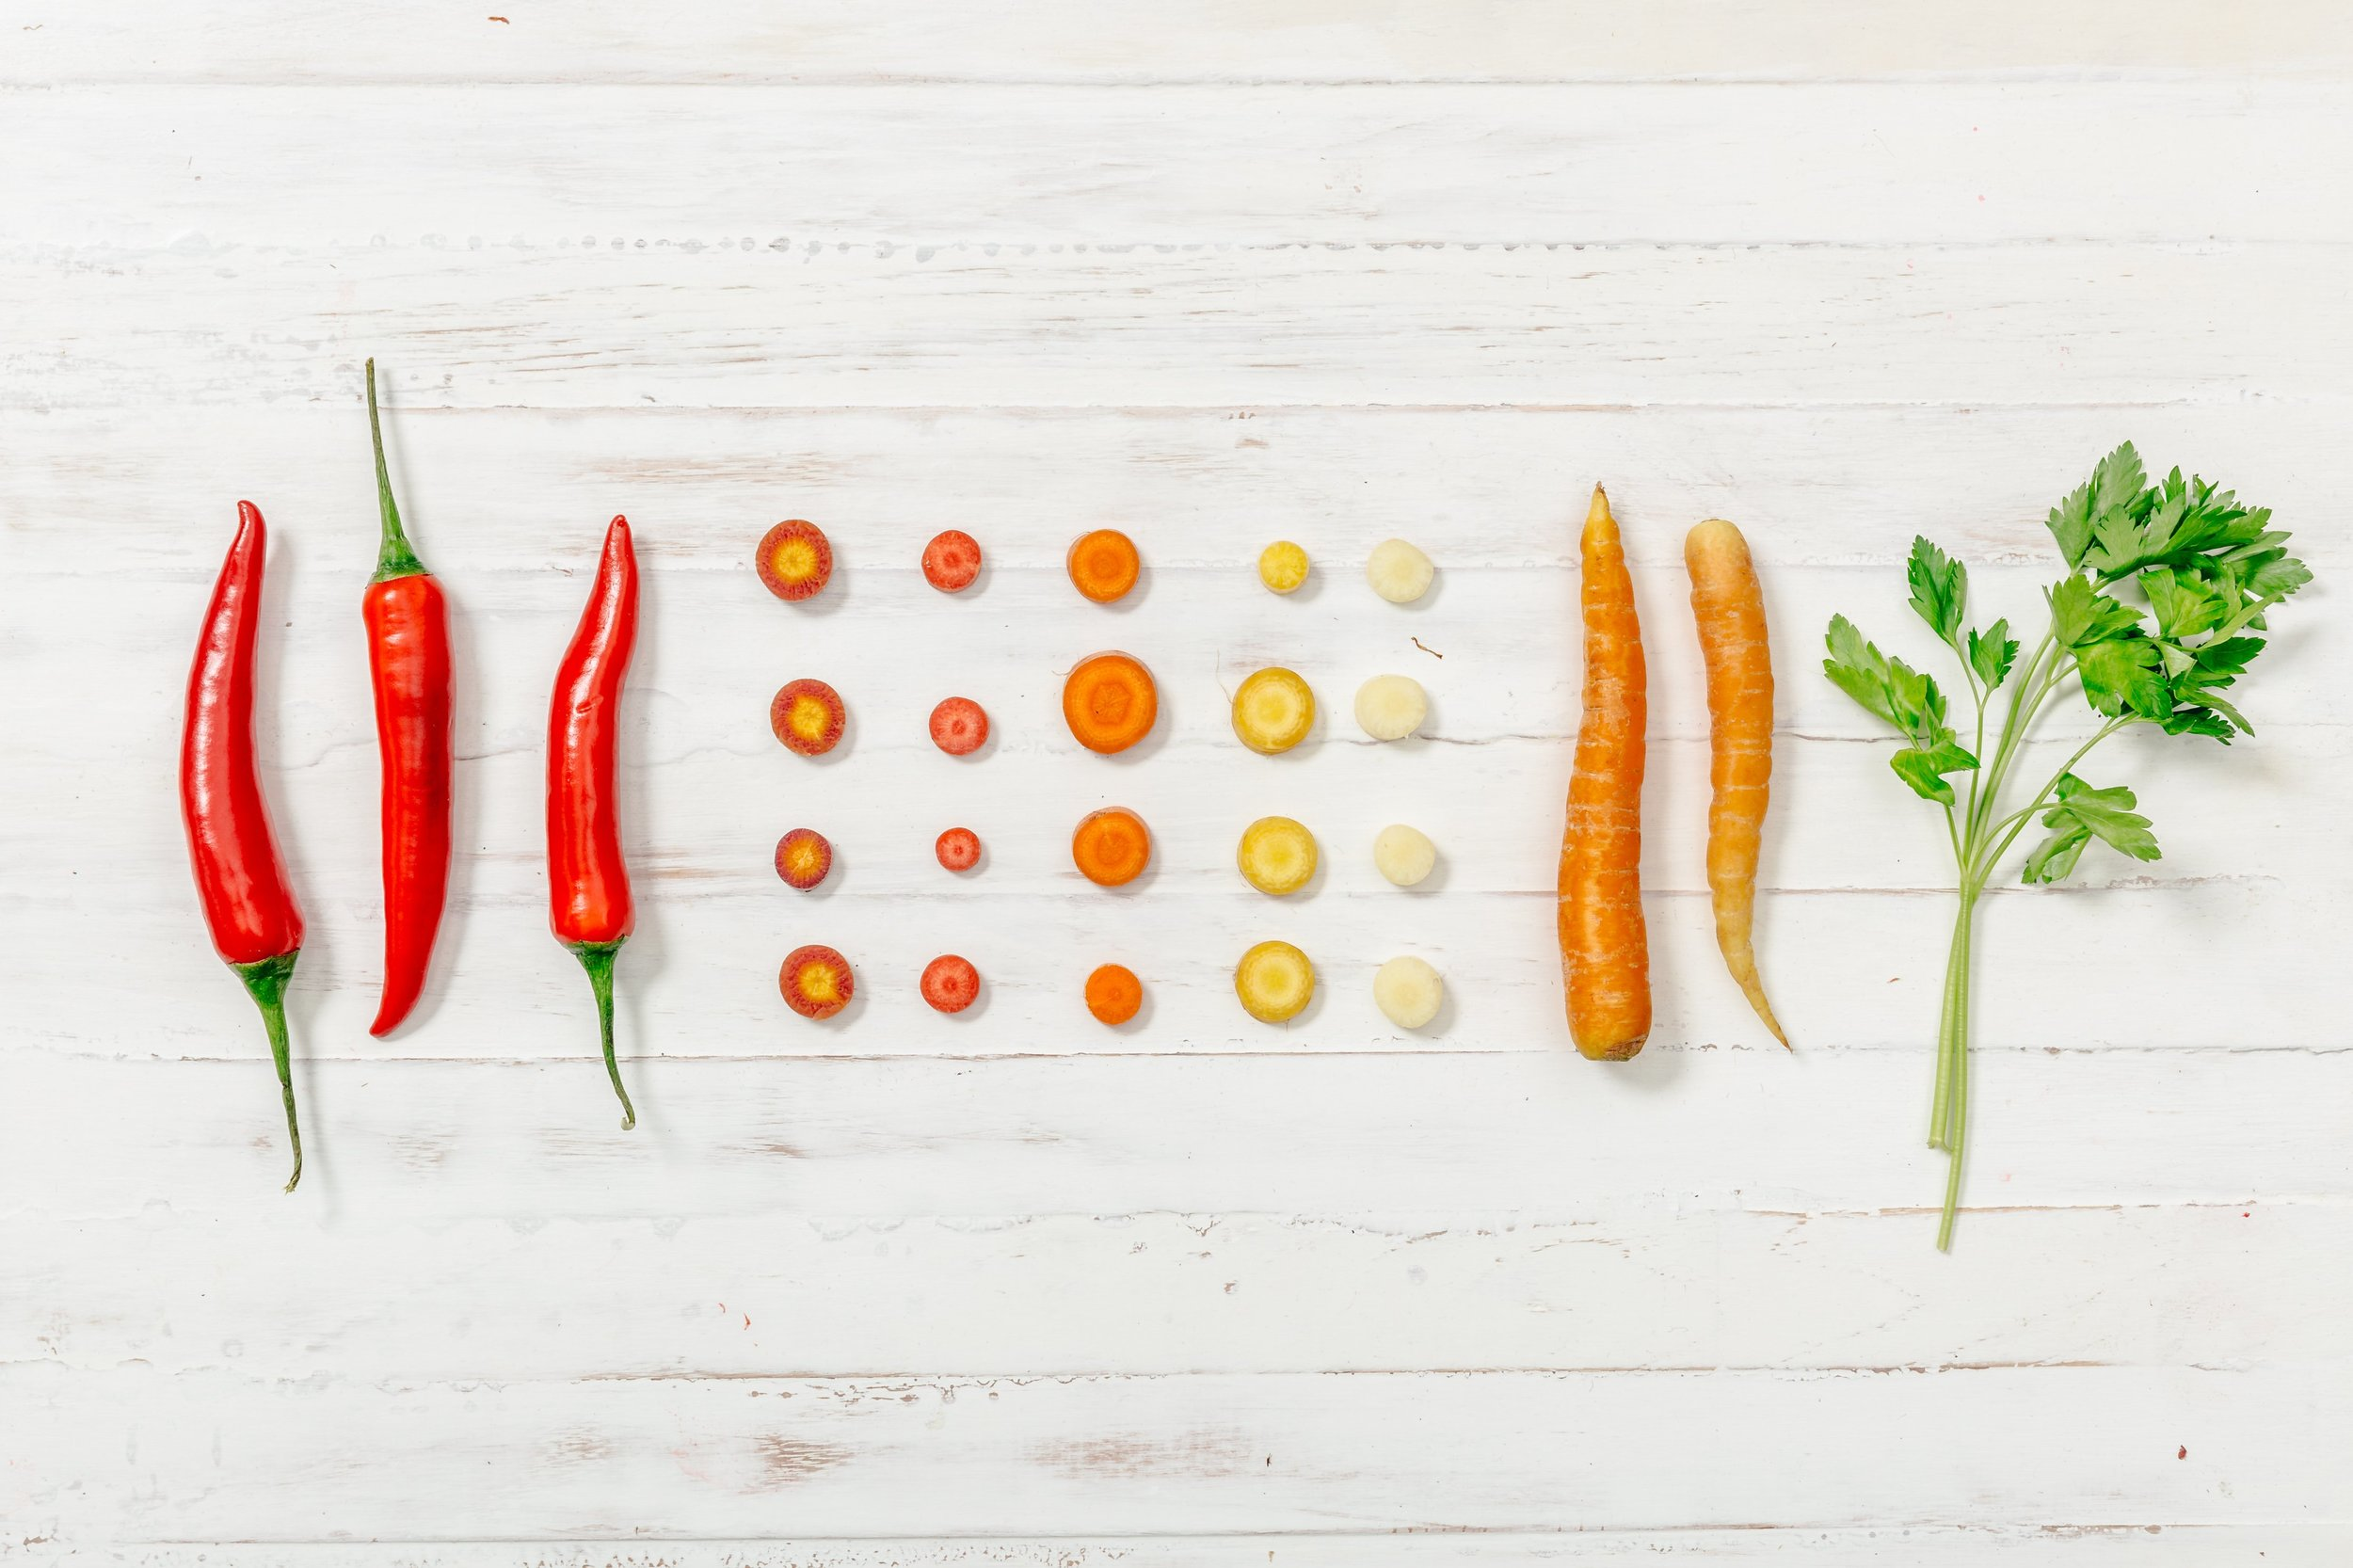 red-orange-yellow-green-vegatables_4460x4460-min.jpg